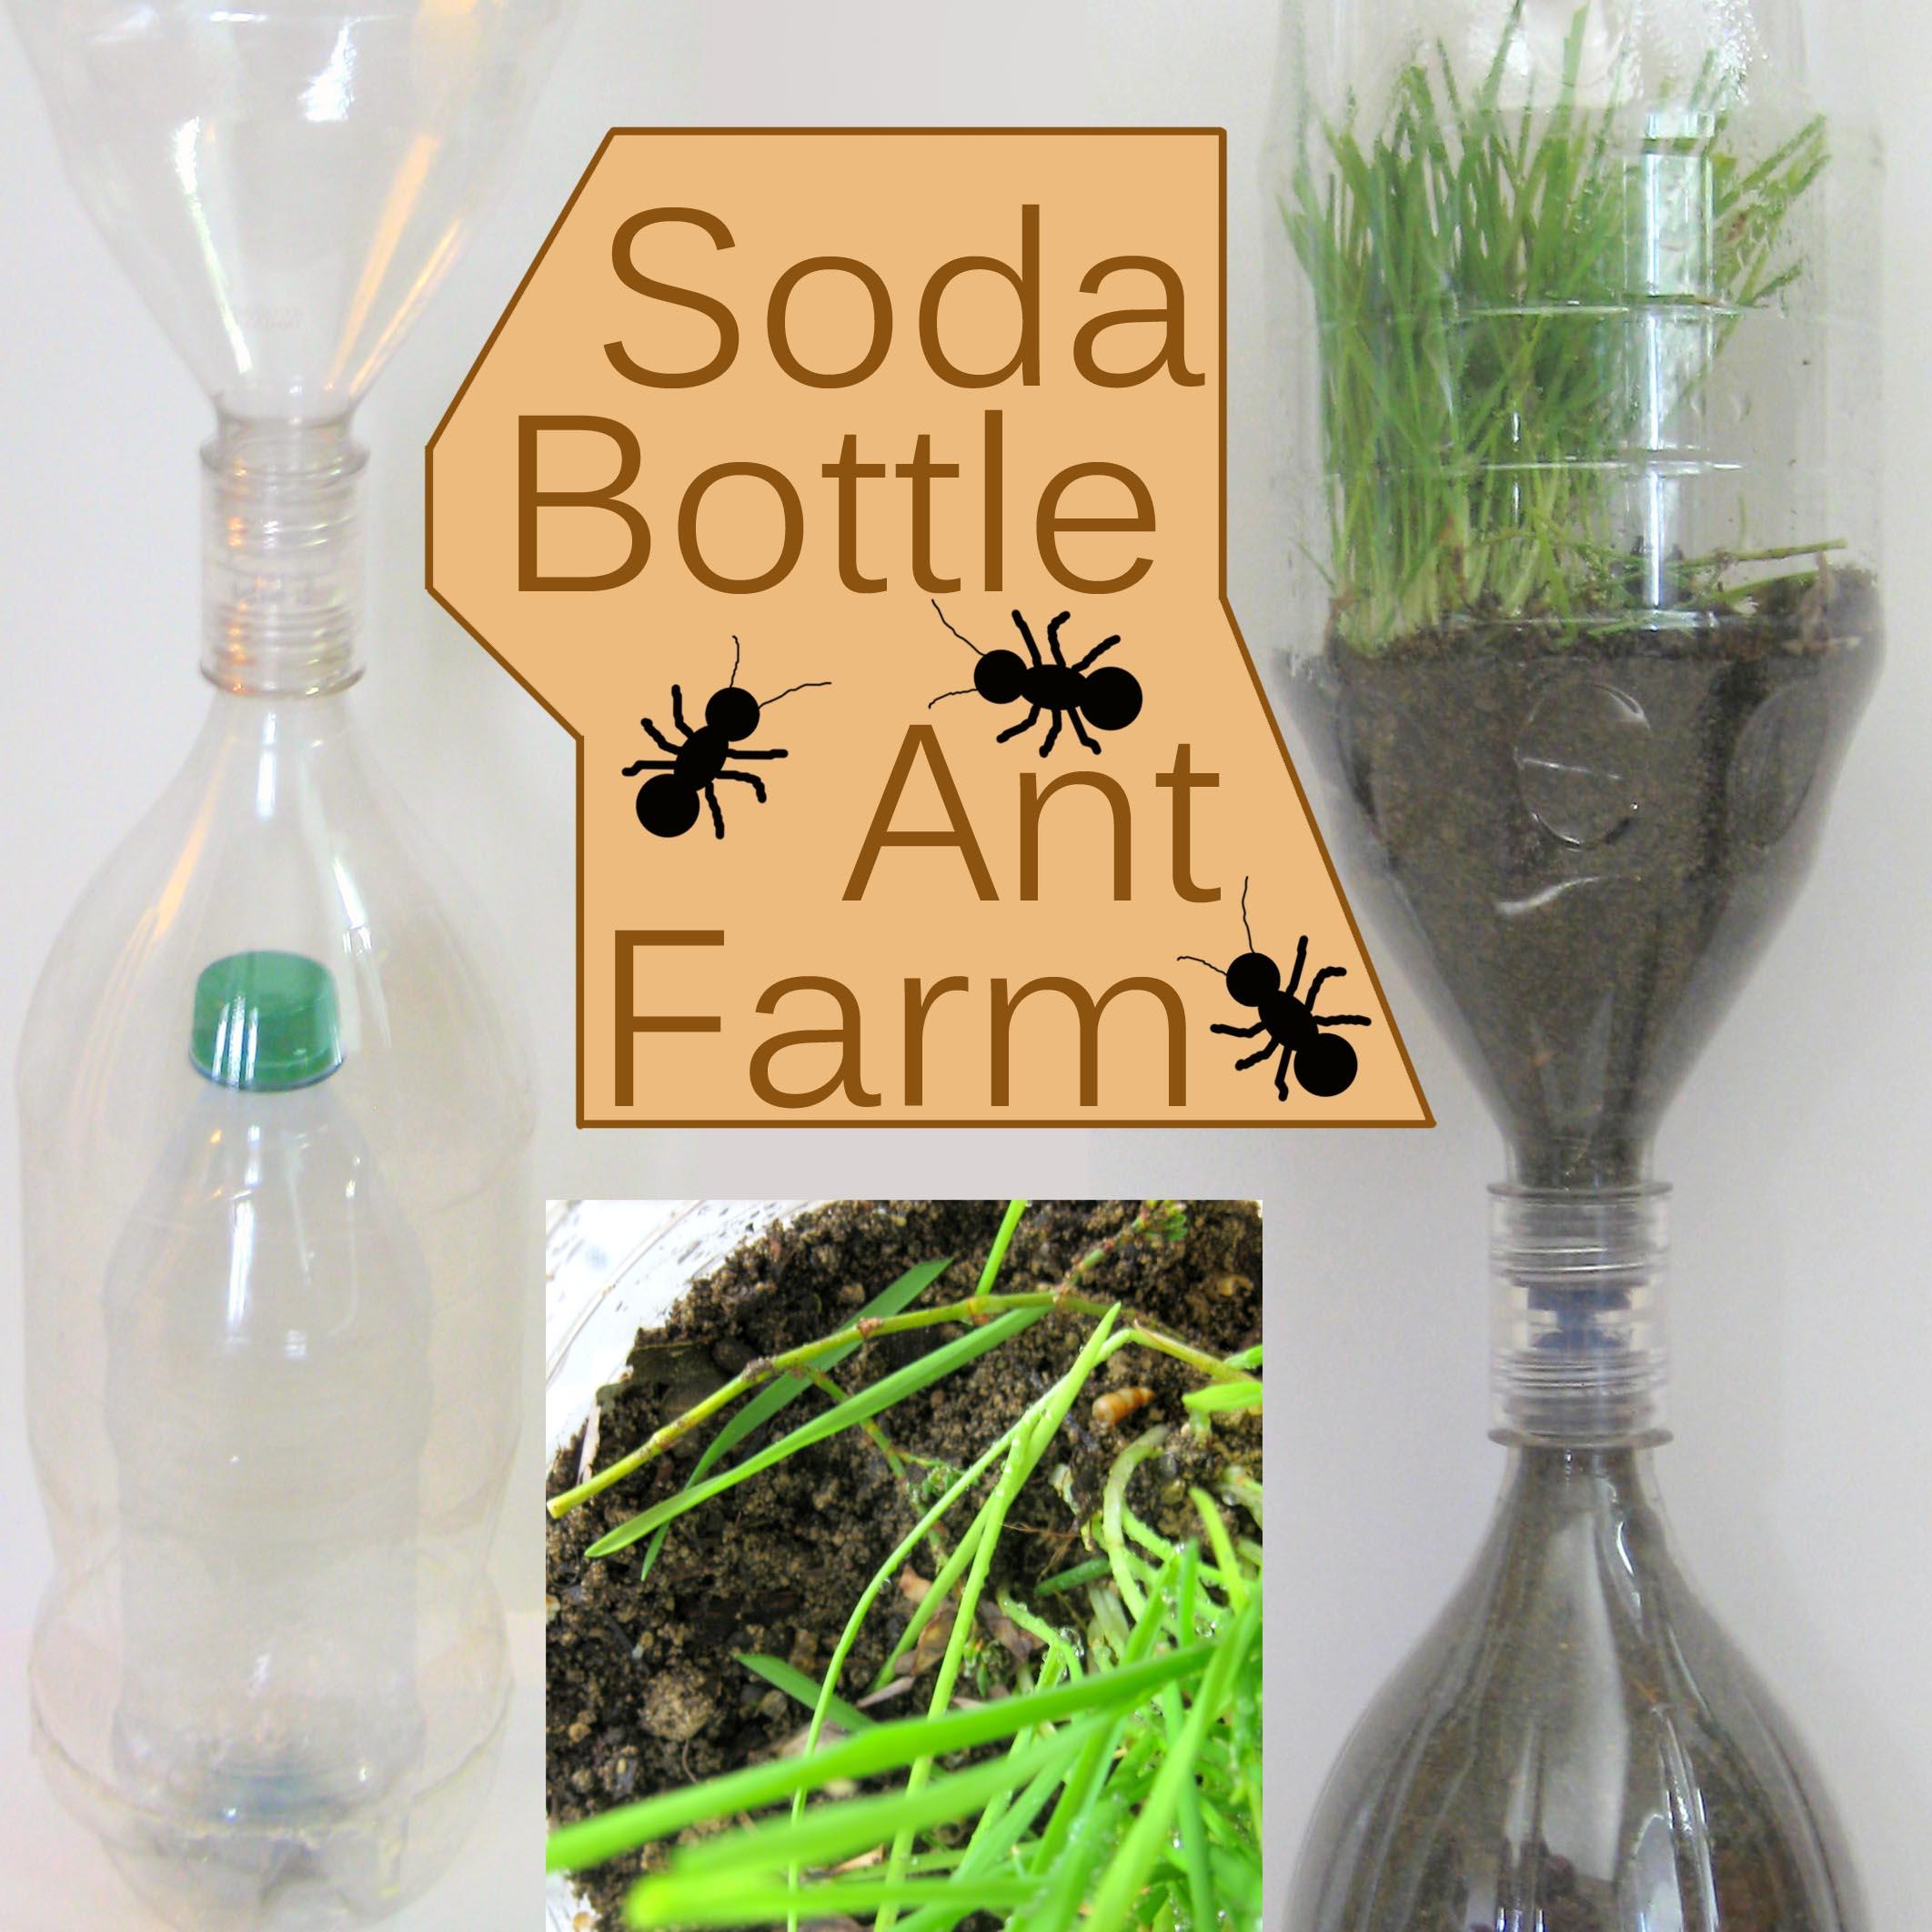 Soda Bottle Ant Farm